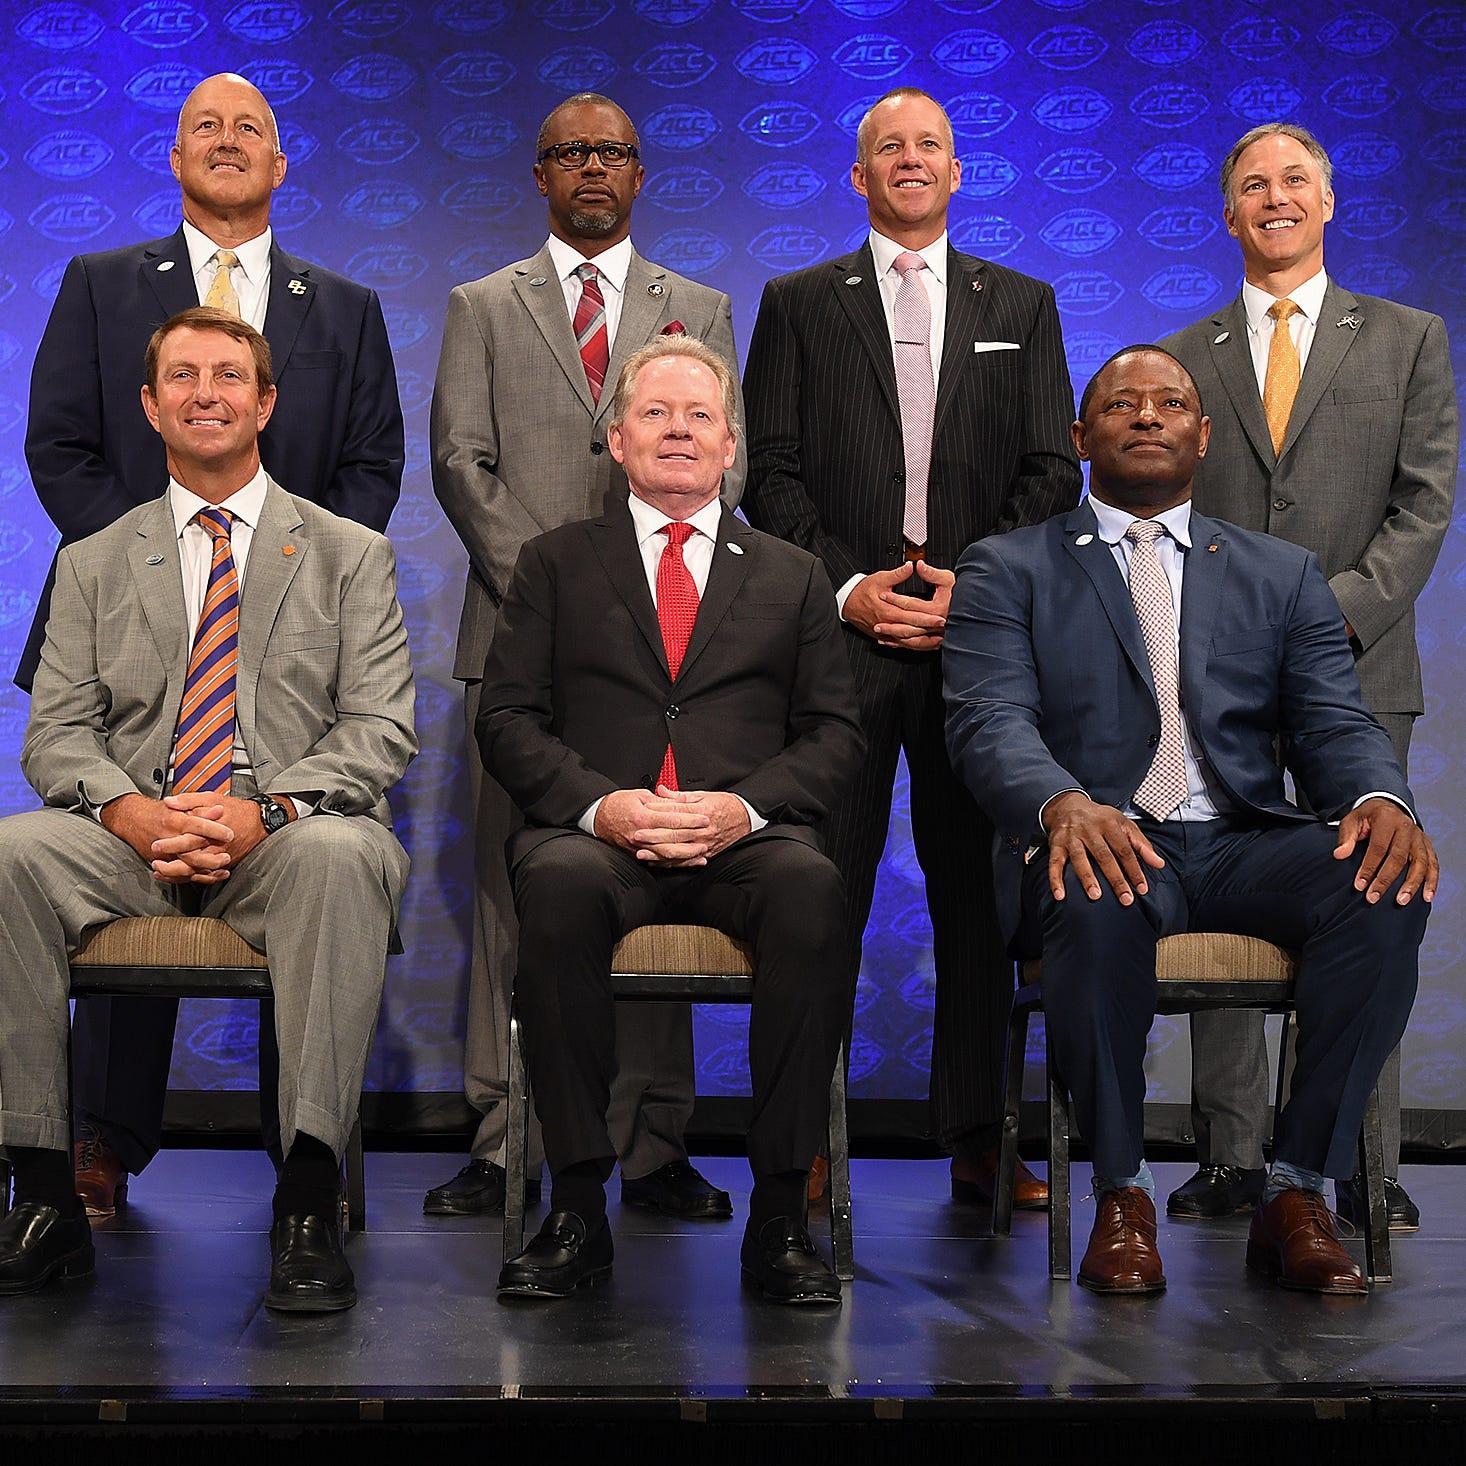 Five things Atlantic Coast Conference coaches said about Clemson Coach Dabo Swinney